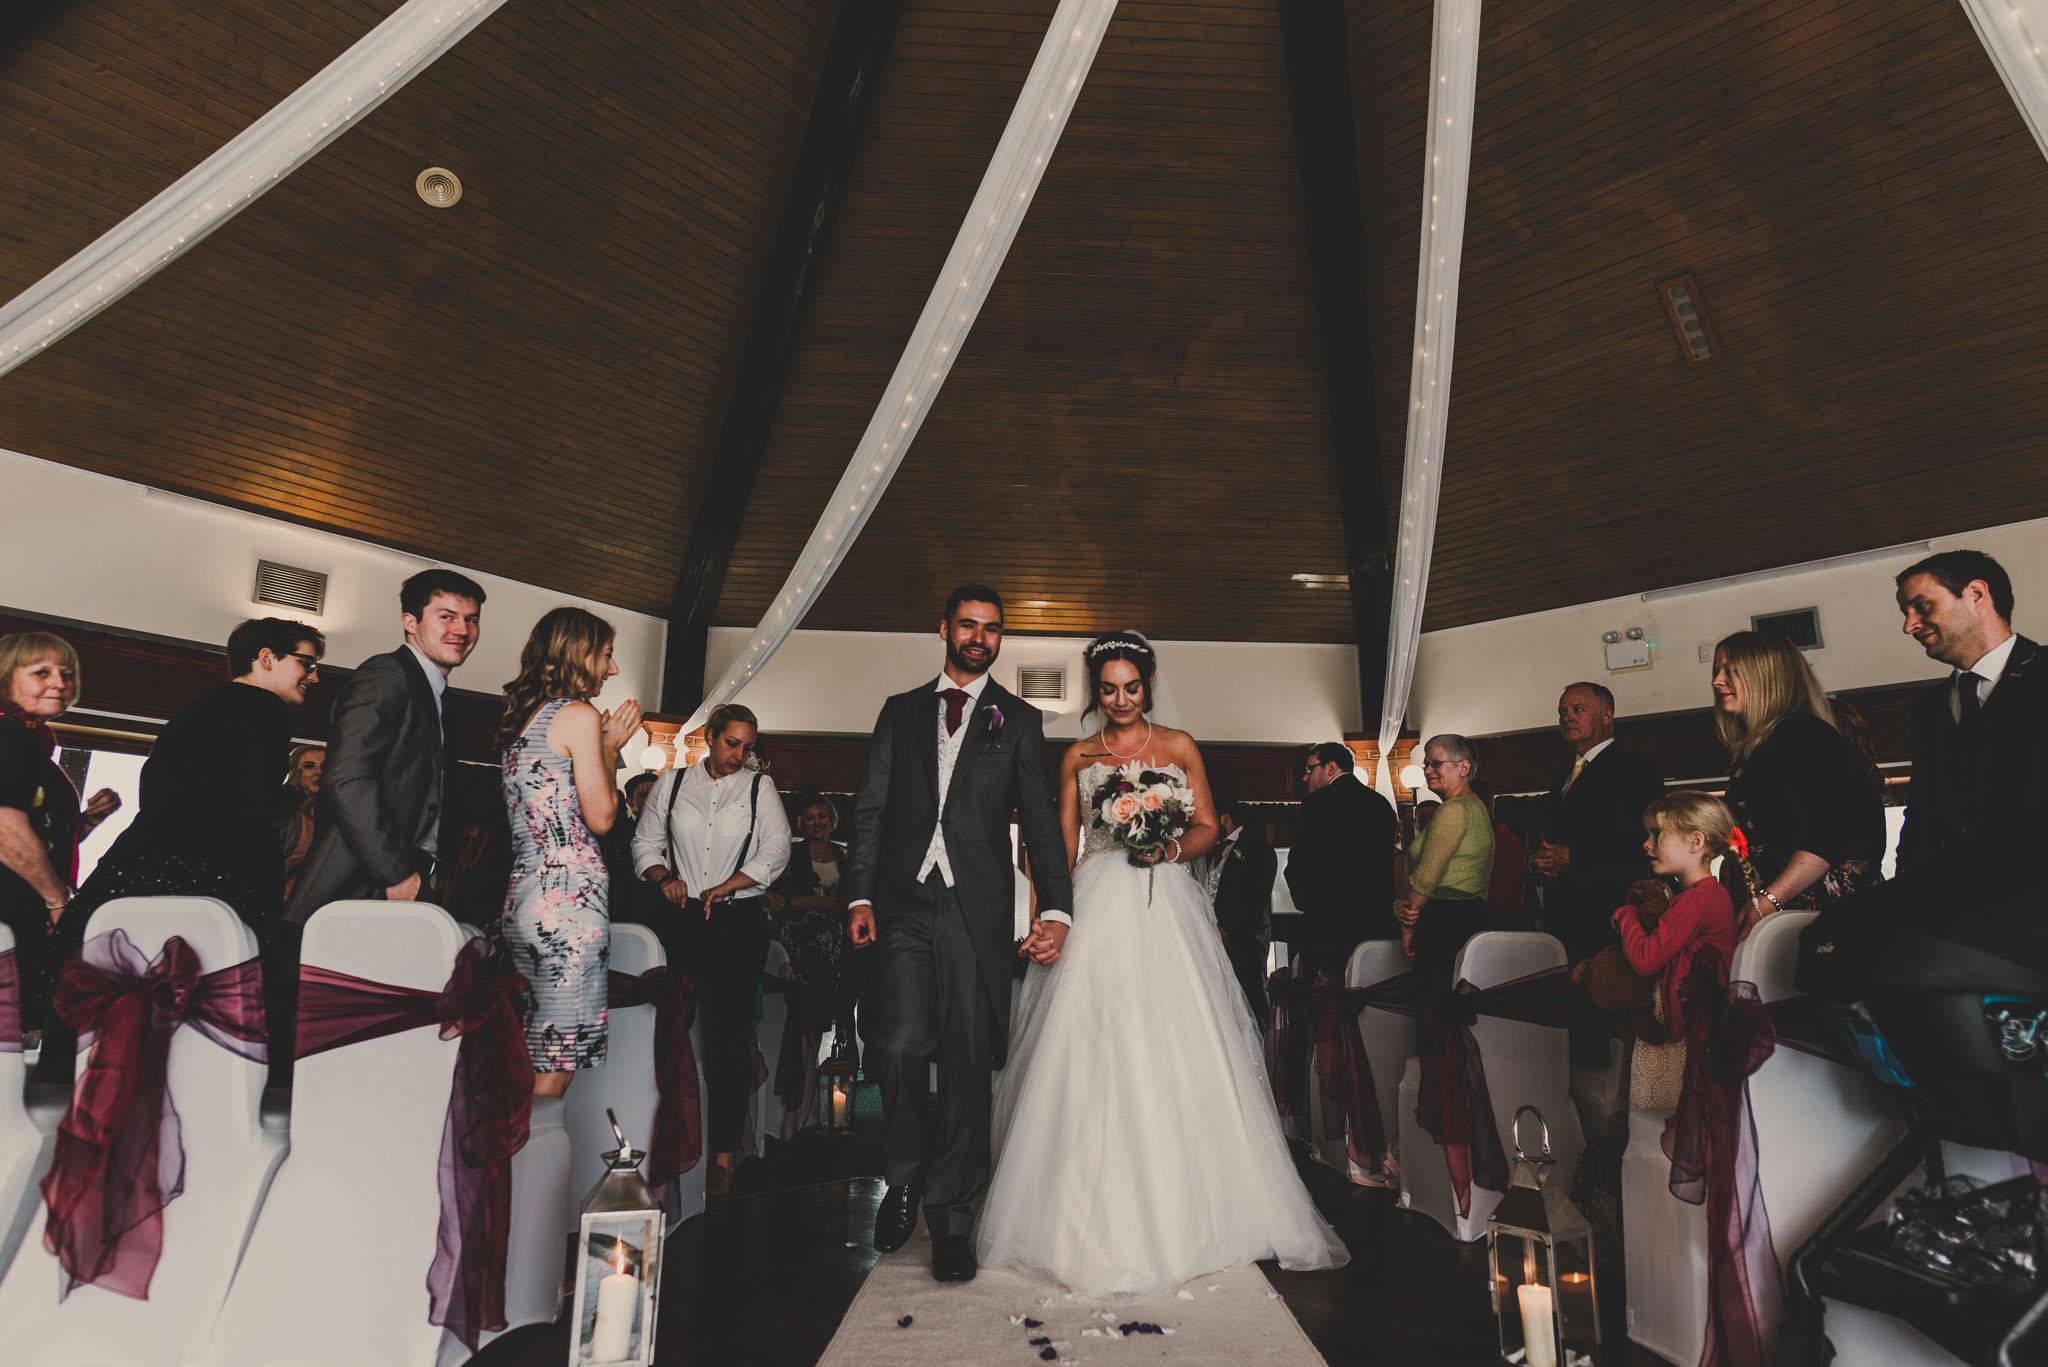 Alternative-wedding-photography-in-manchester-jade-maguire-photograhy (12).jpg